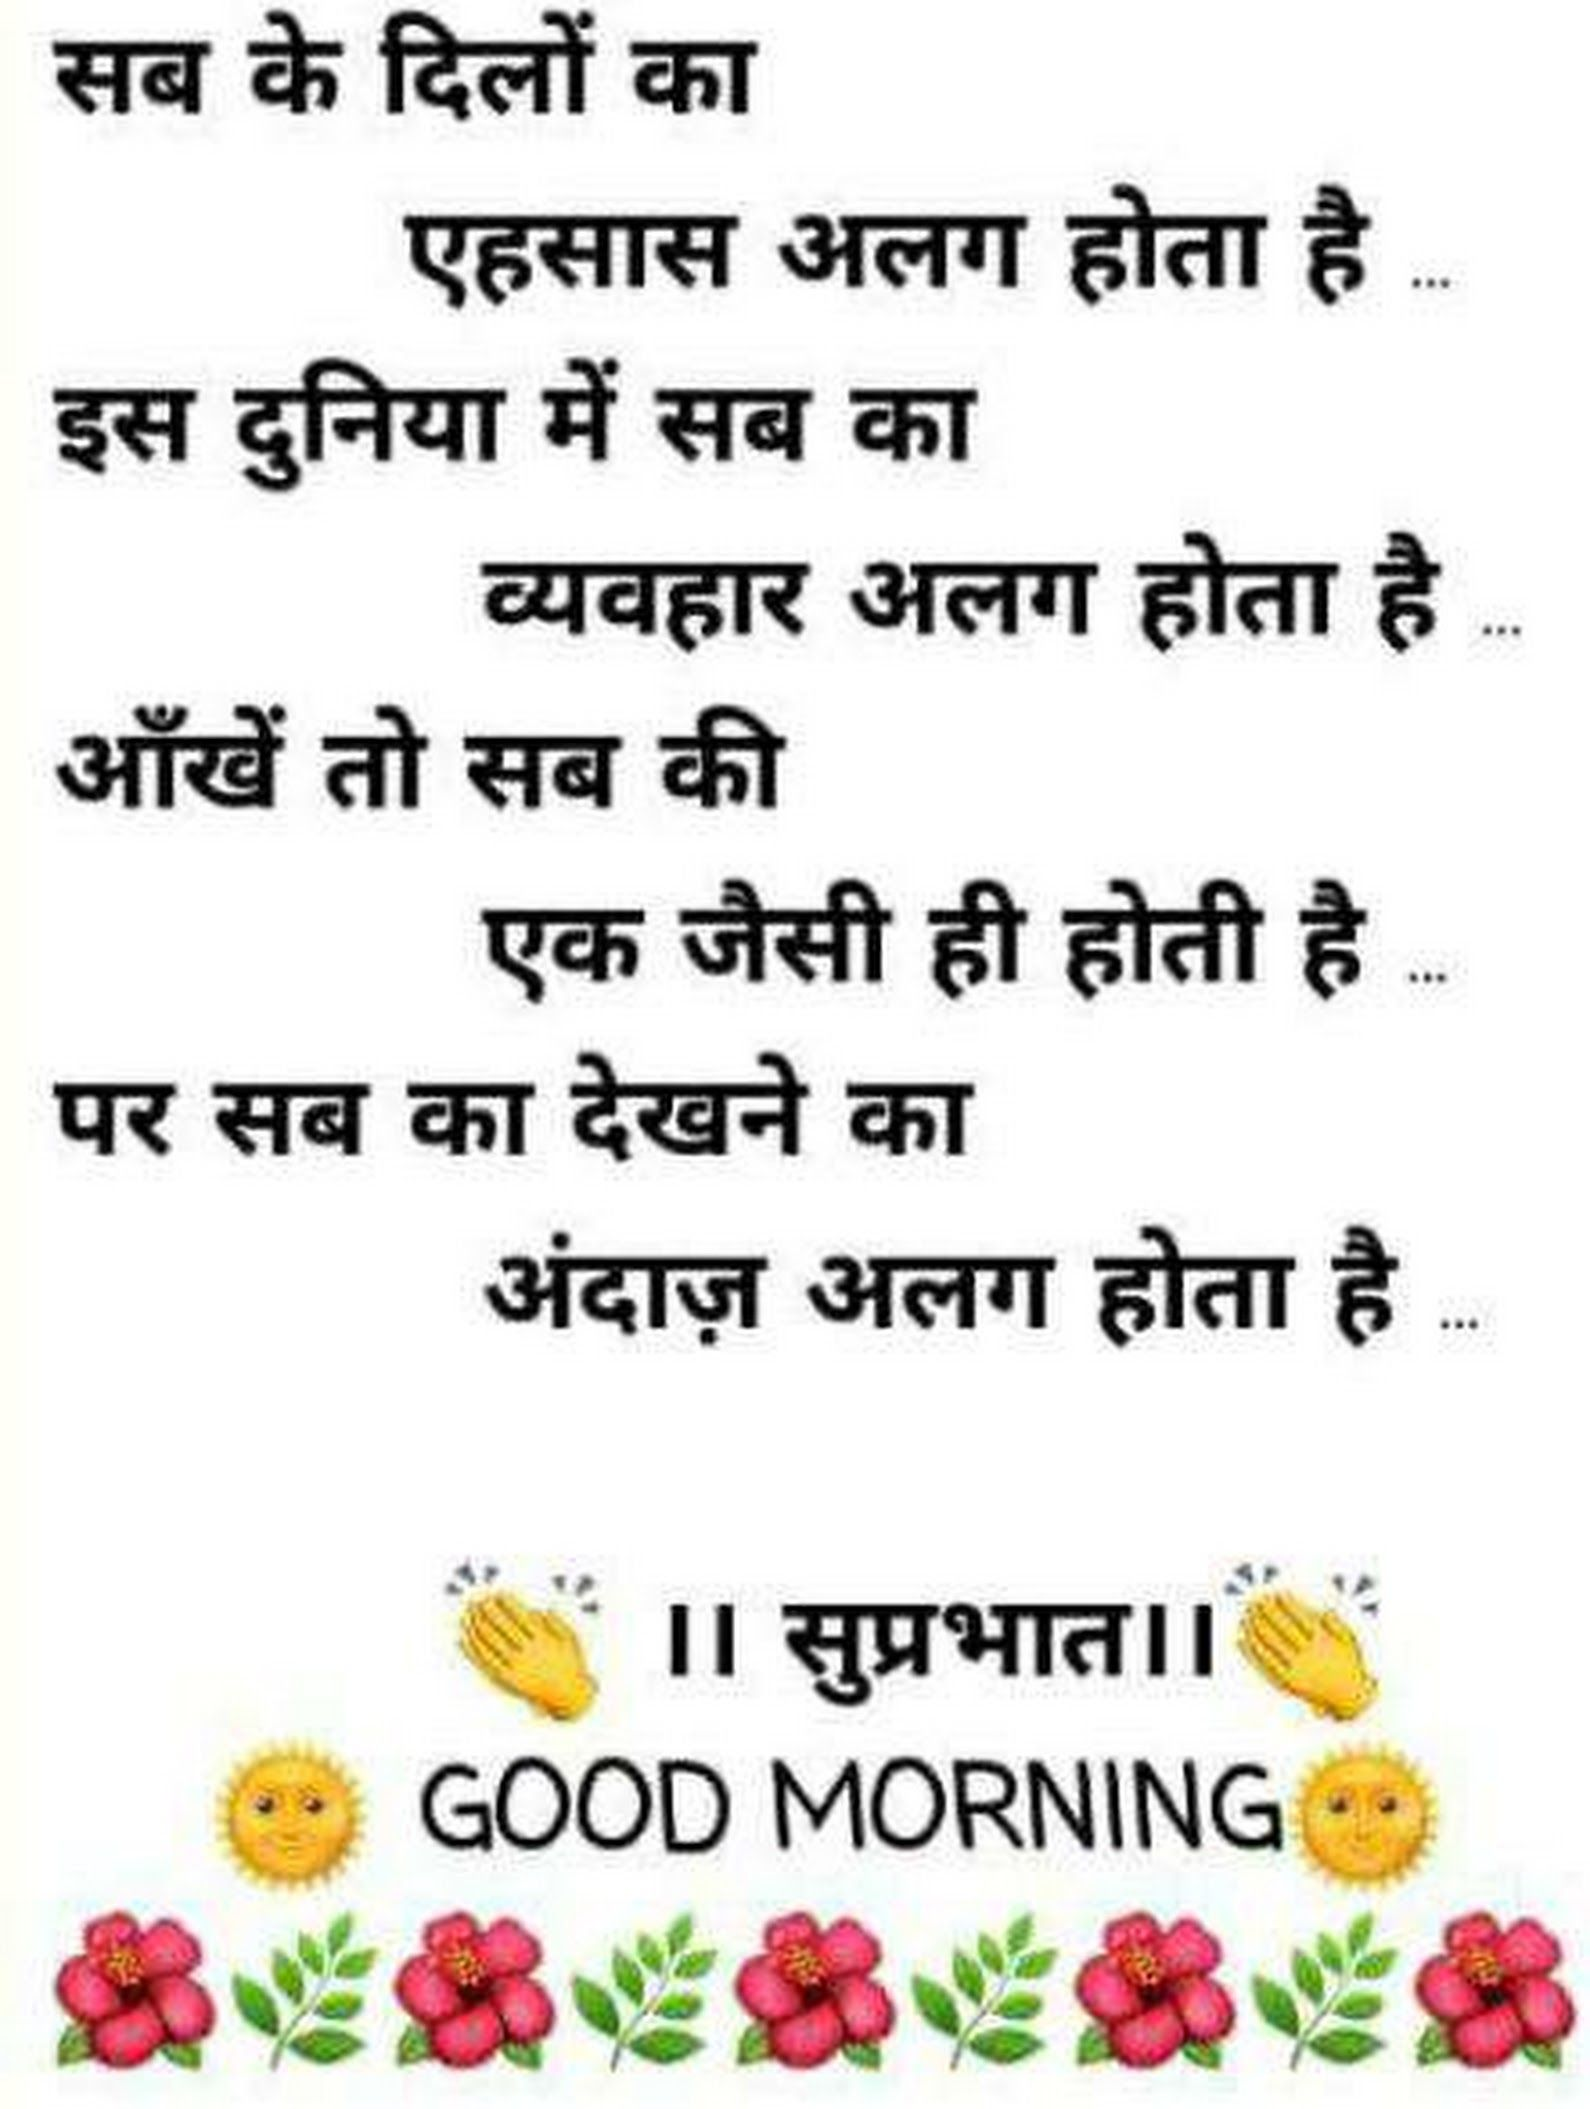 Sign In Hindi Good Morning Quotes